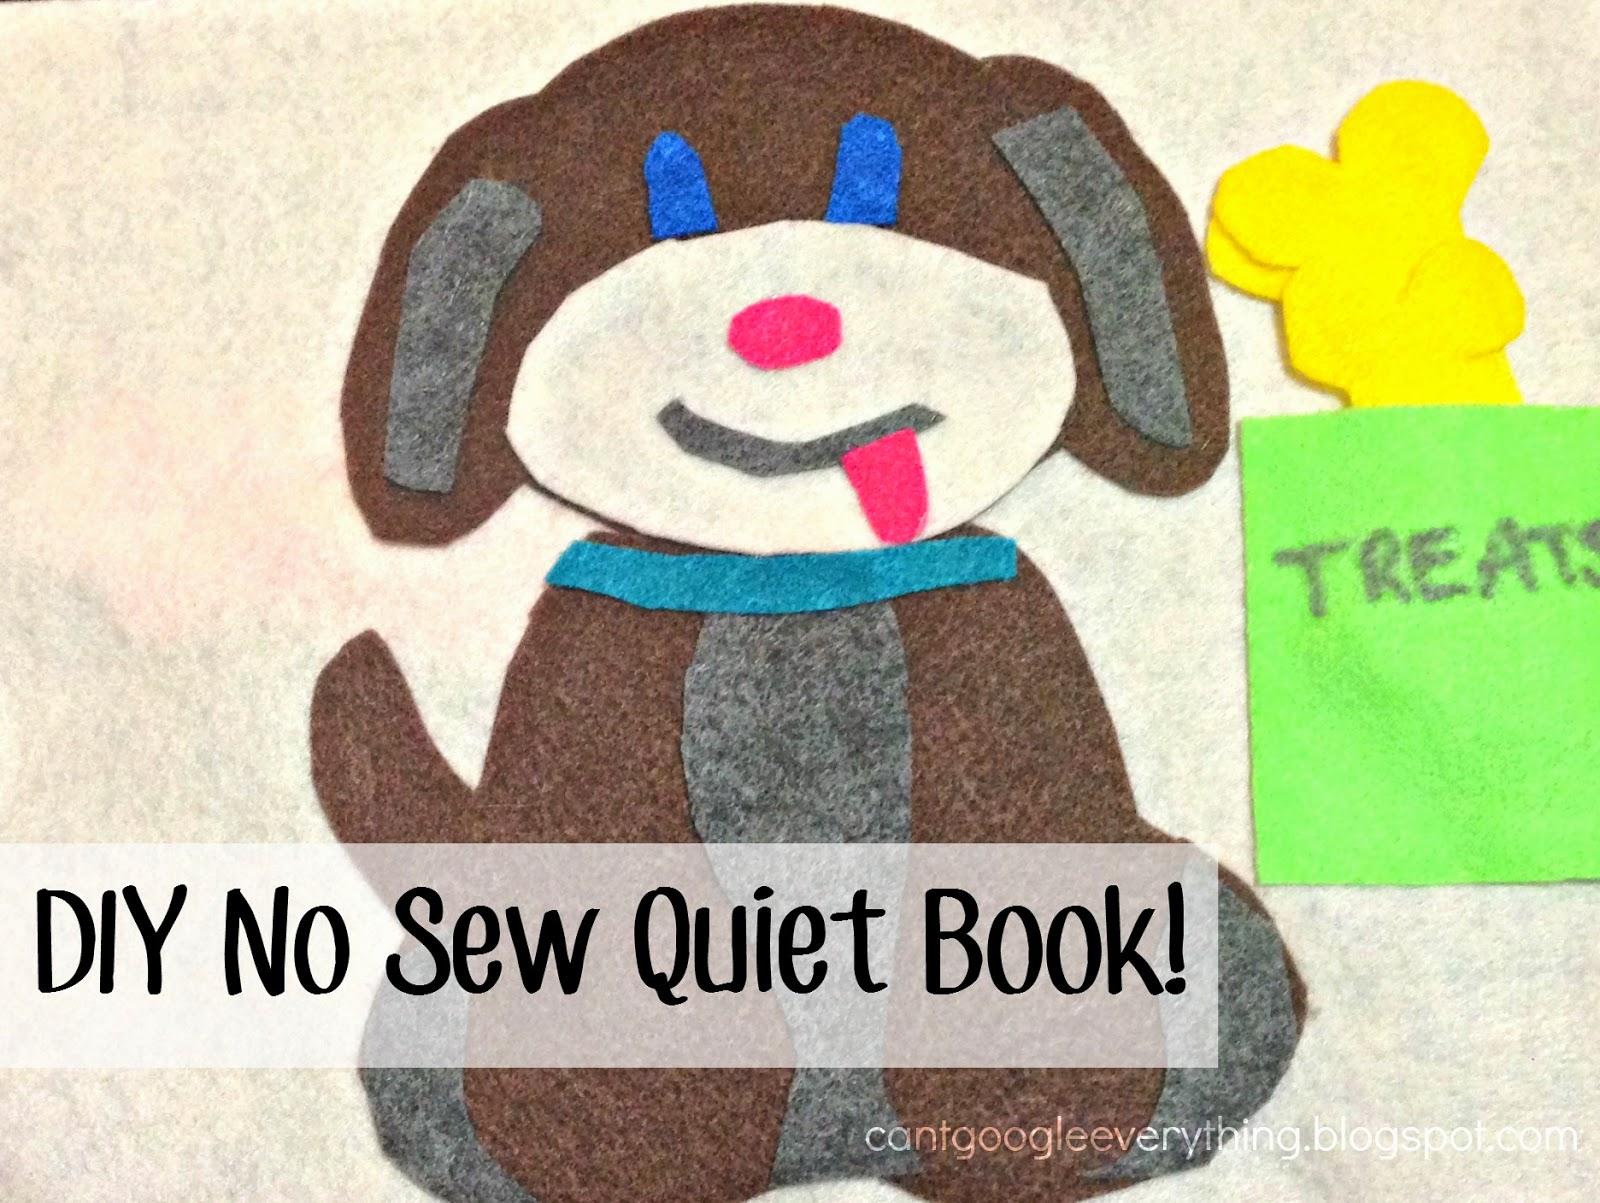 Diy no sew quiet book ideas my mini adventurer for The idea door quiet book